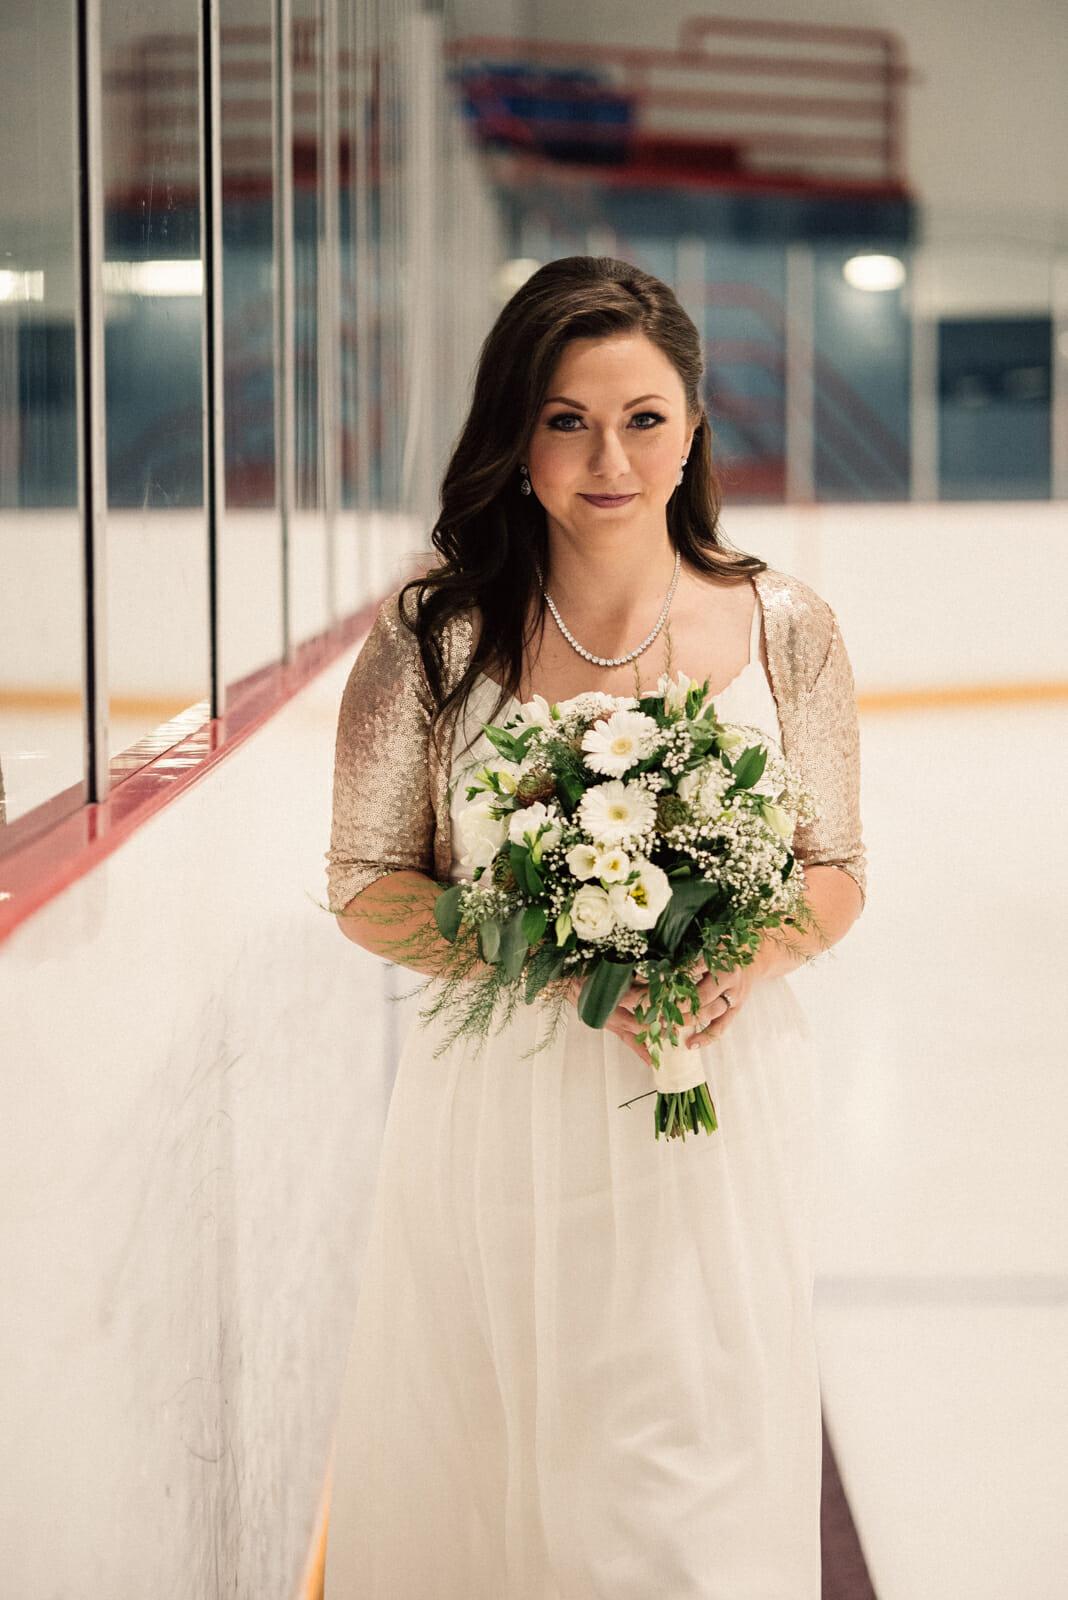 Nottawasaga inn wedding pictures